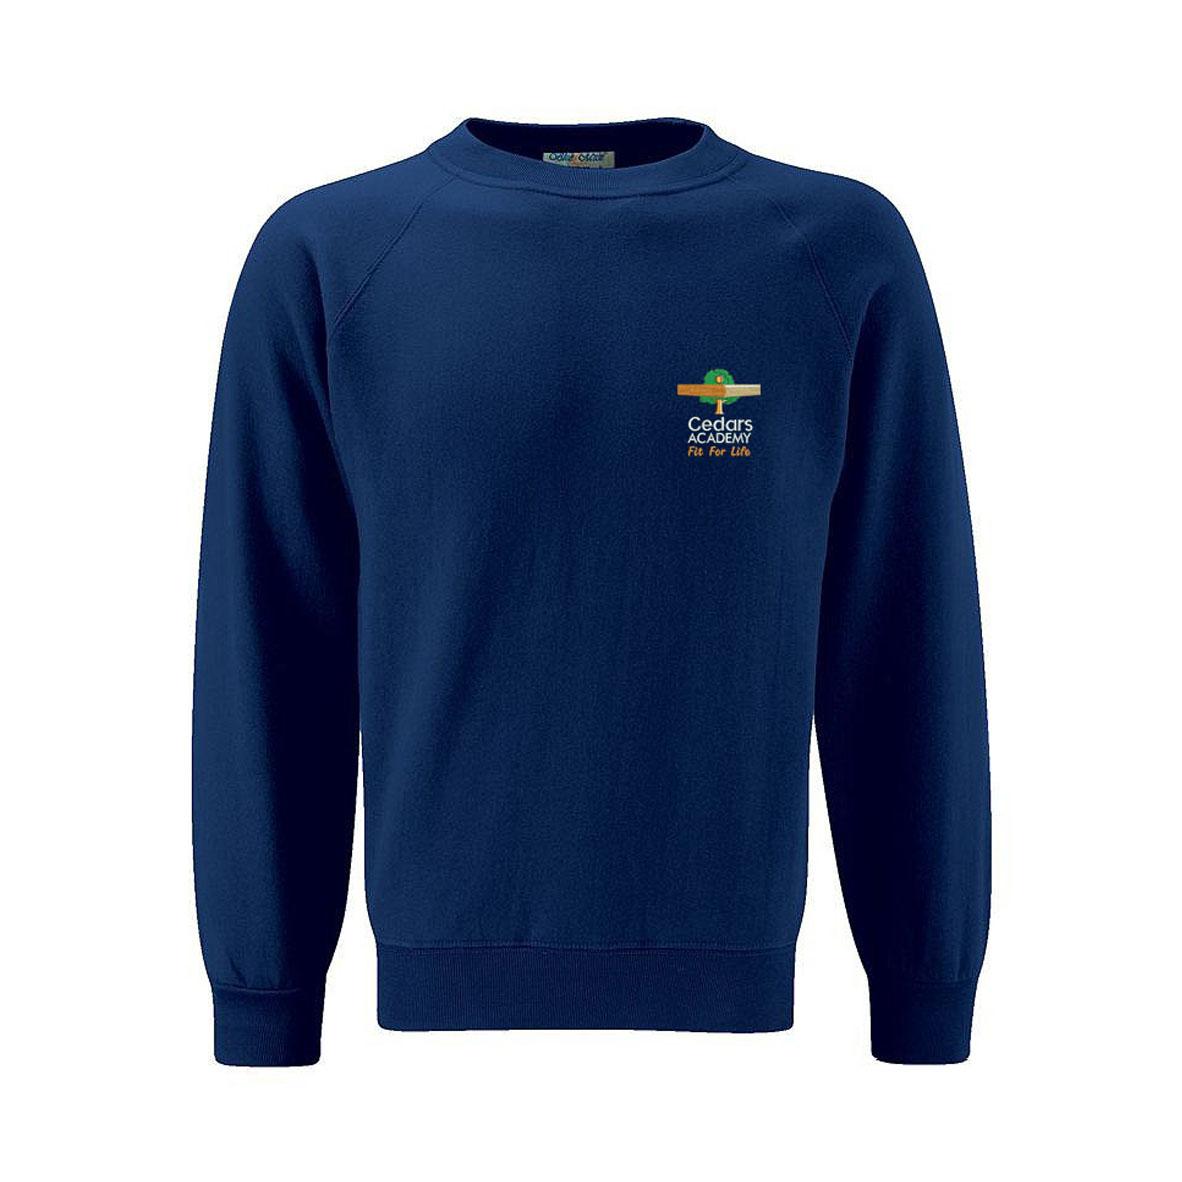 Cedars Sweatshirt